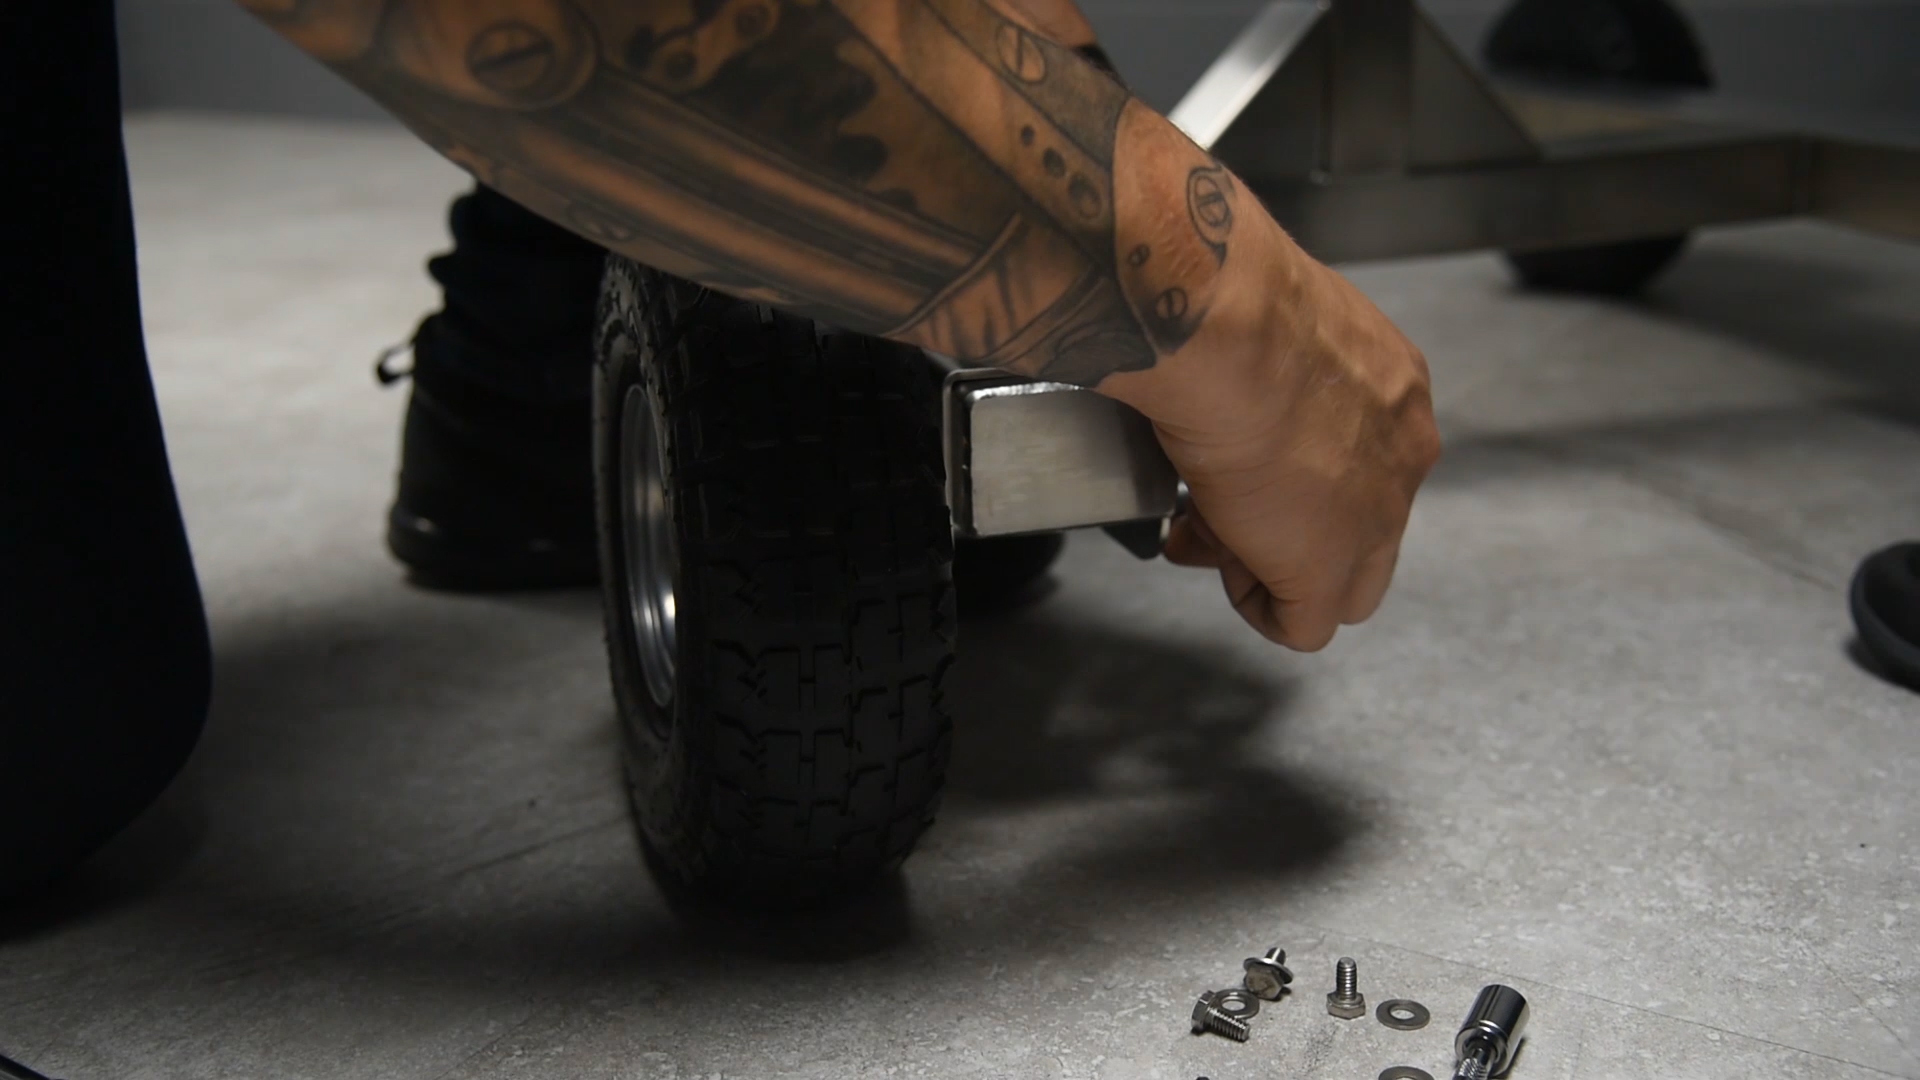 upslose image of man's hand putting wheel back on a Mobius Bucker